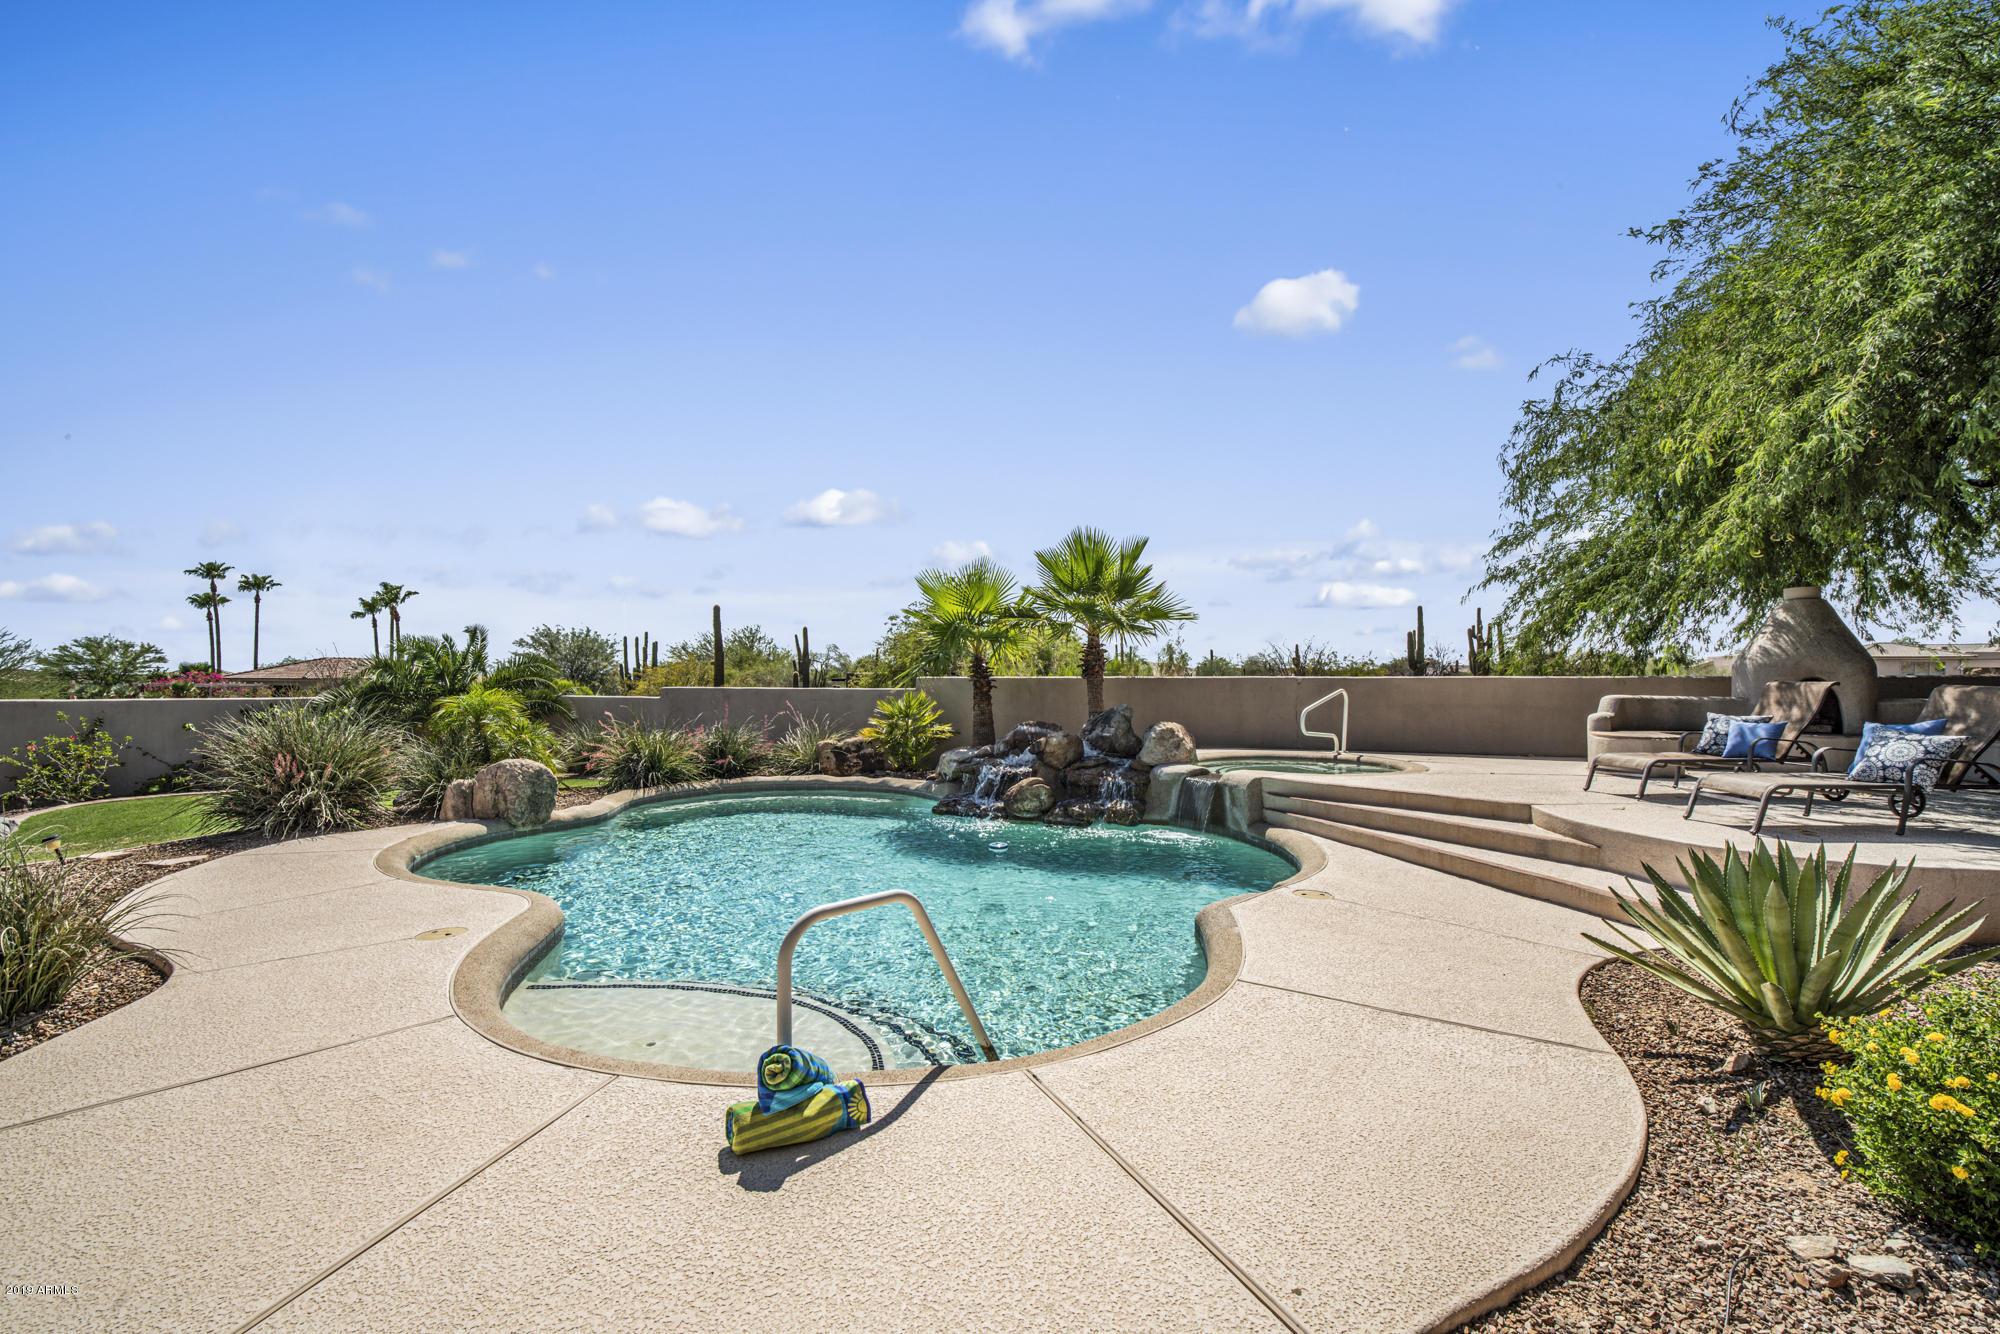 MLS 5960471 9682 N 131ST Street, Scottsdale, AZ 85259 Scottsdale AZ Private Pool